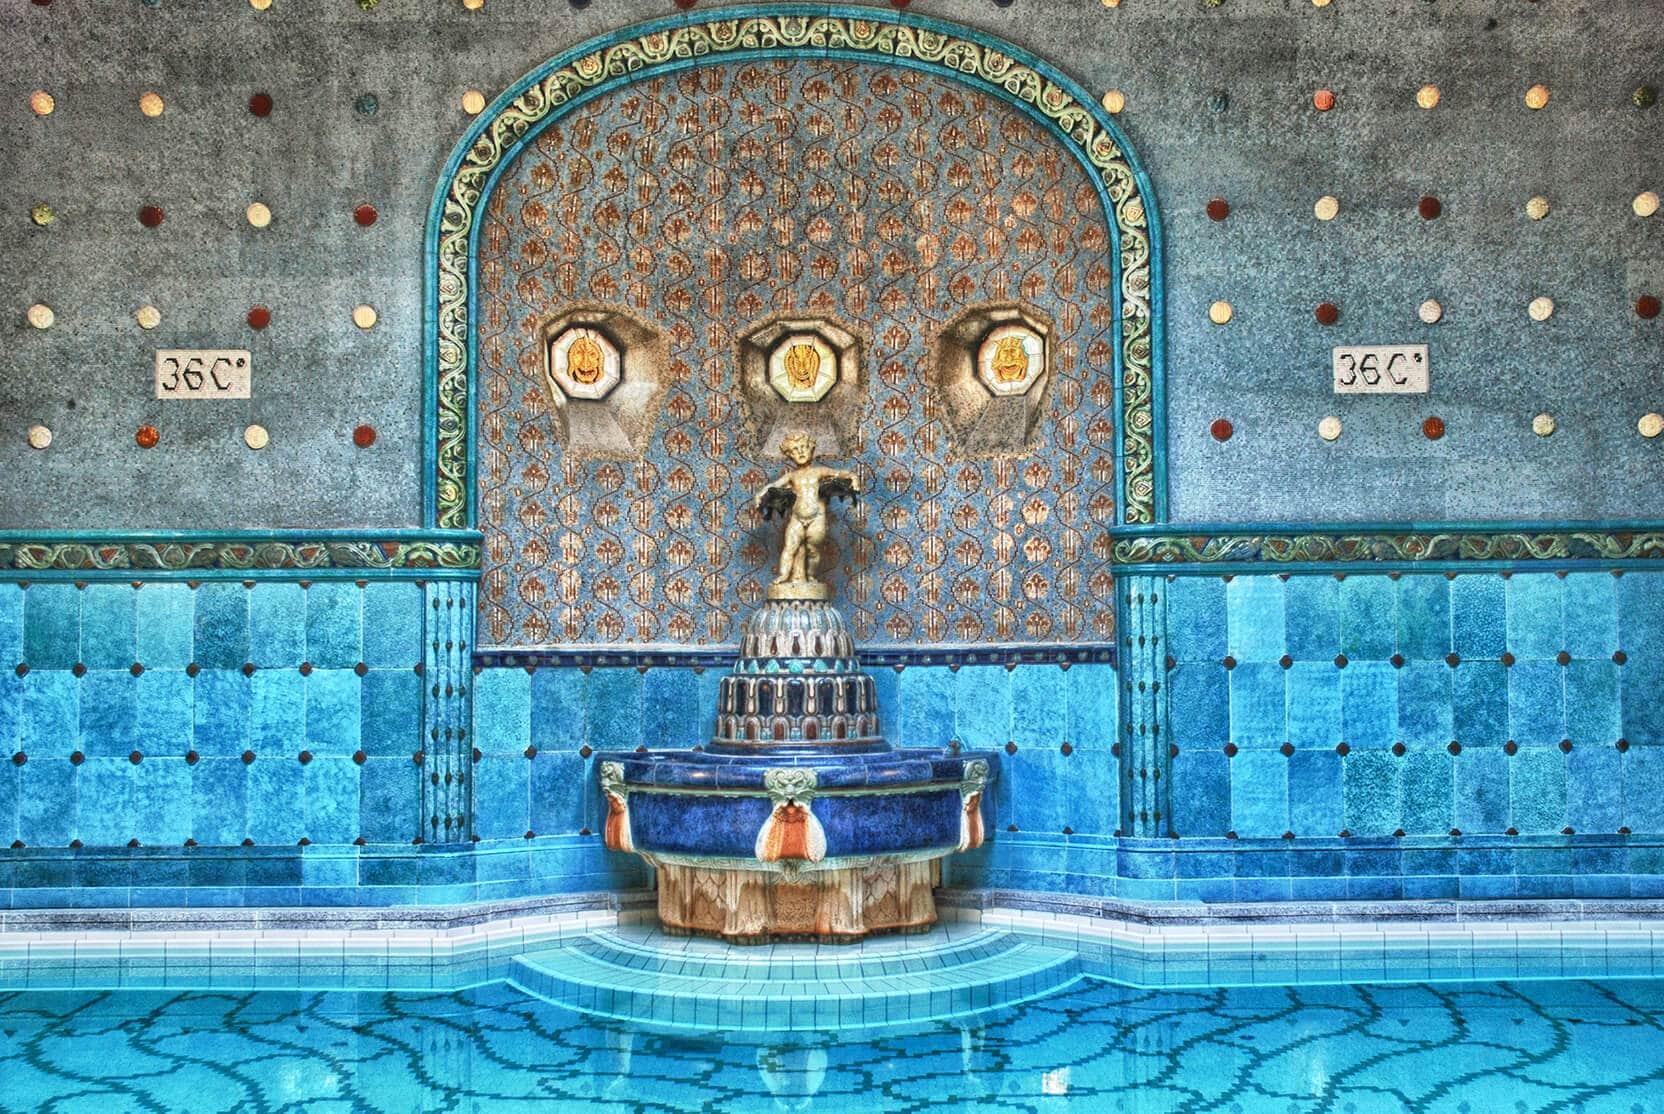 Budapest Instagram photo guide - Gellért Thermal Spa Baths